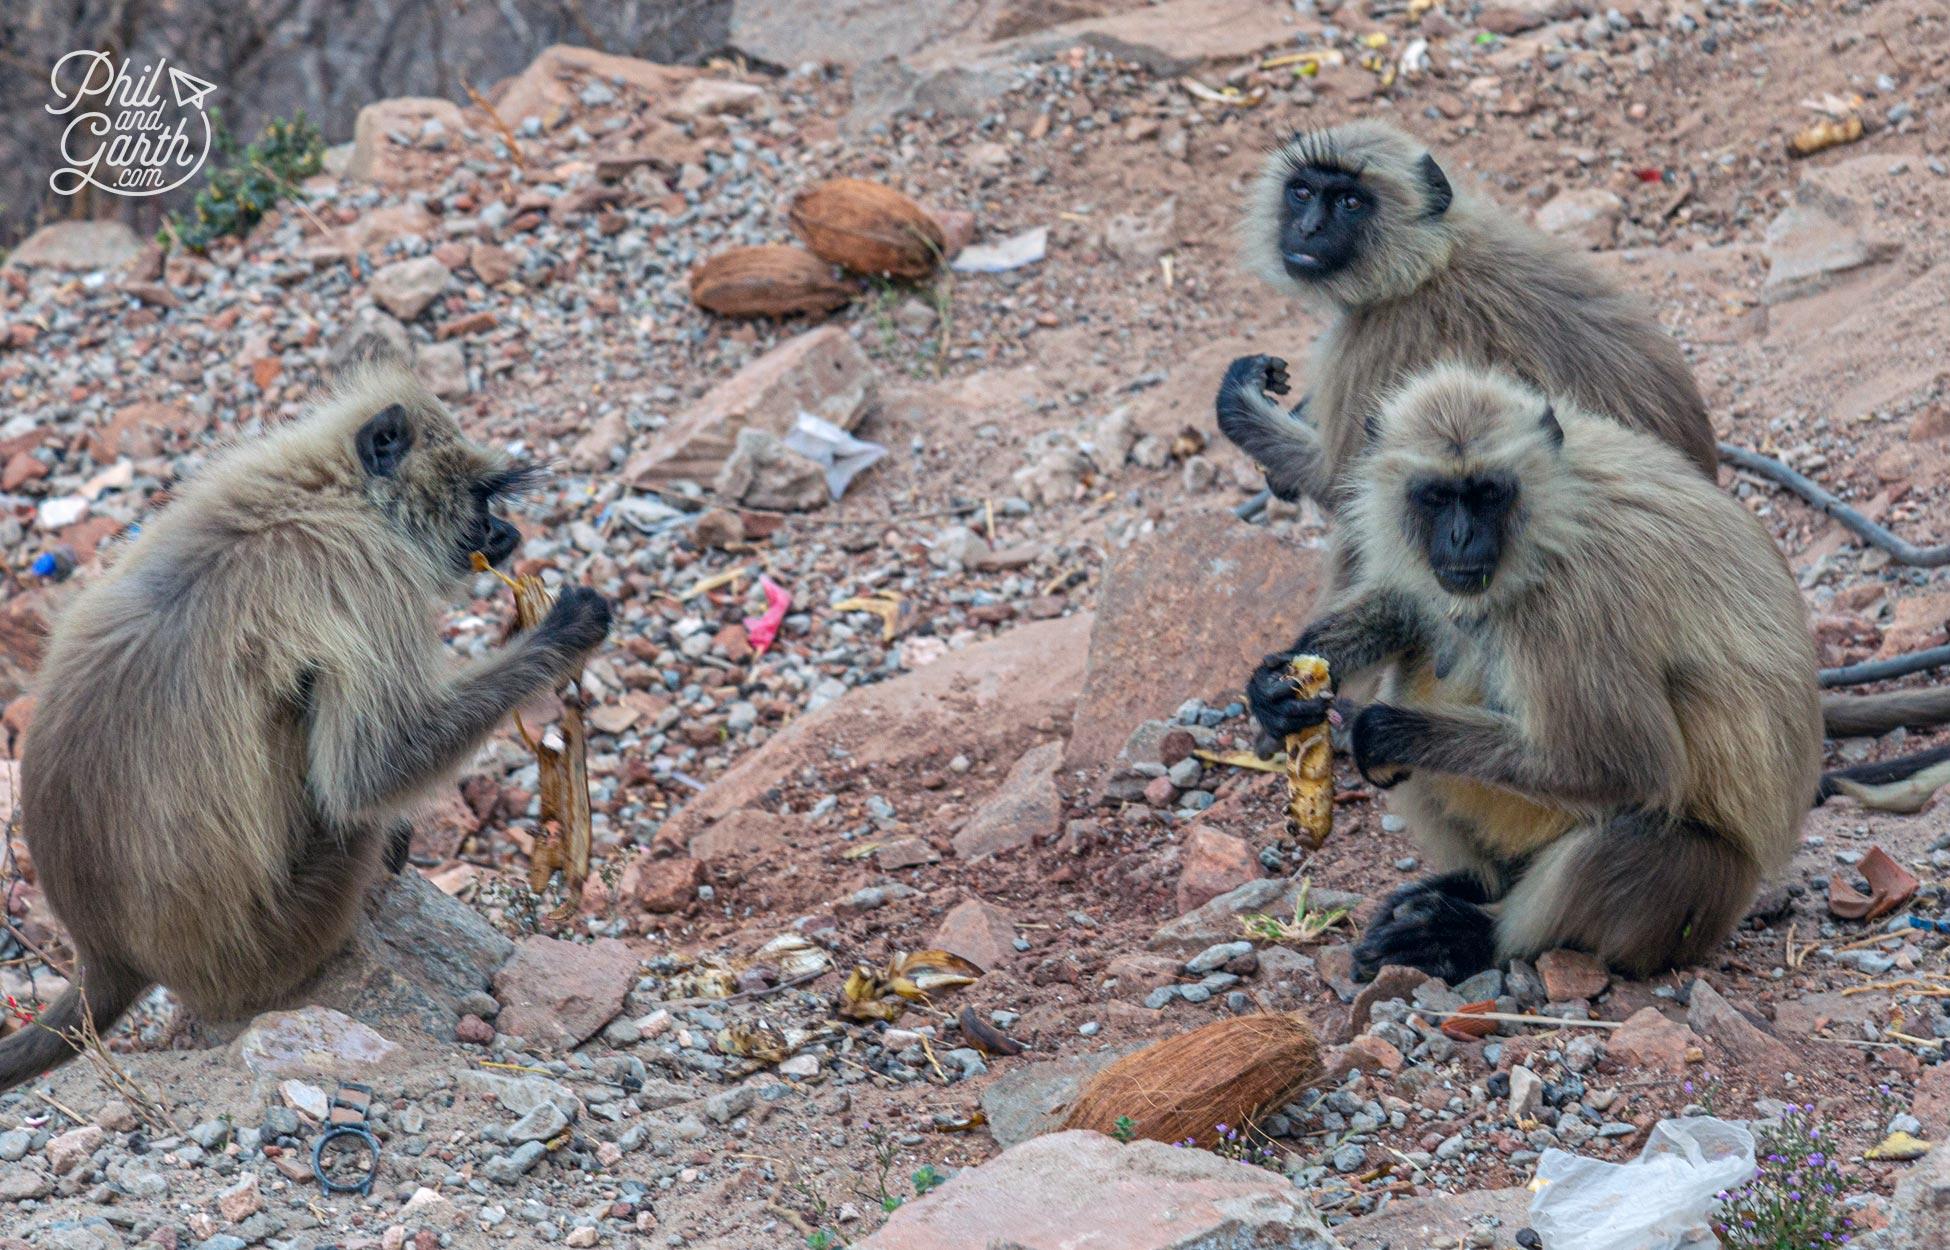 The monkeys love bananas and coconuts!